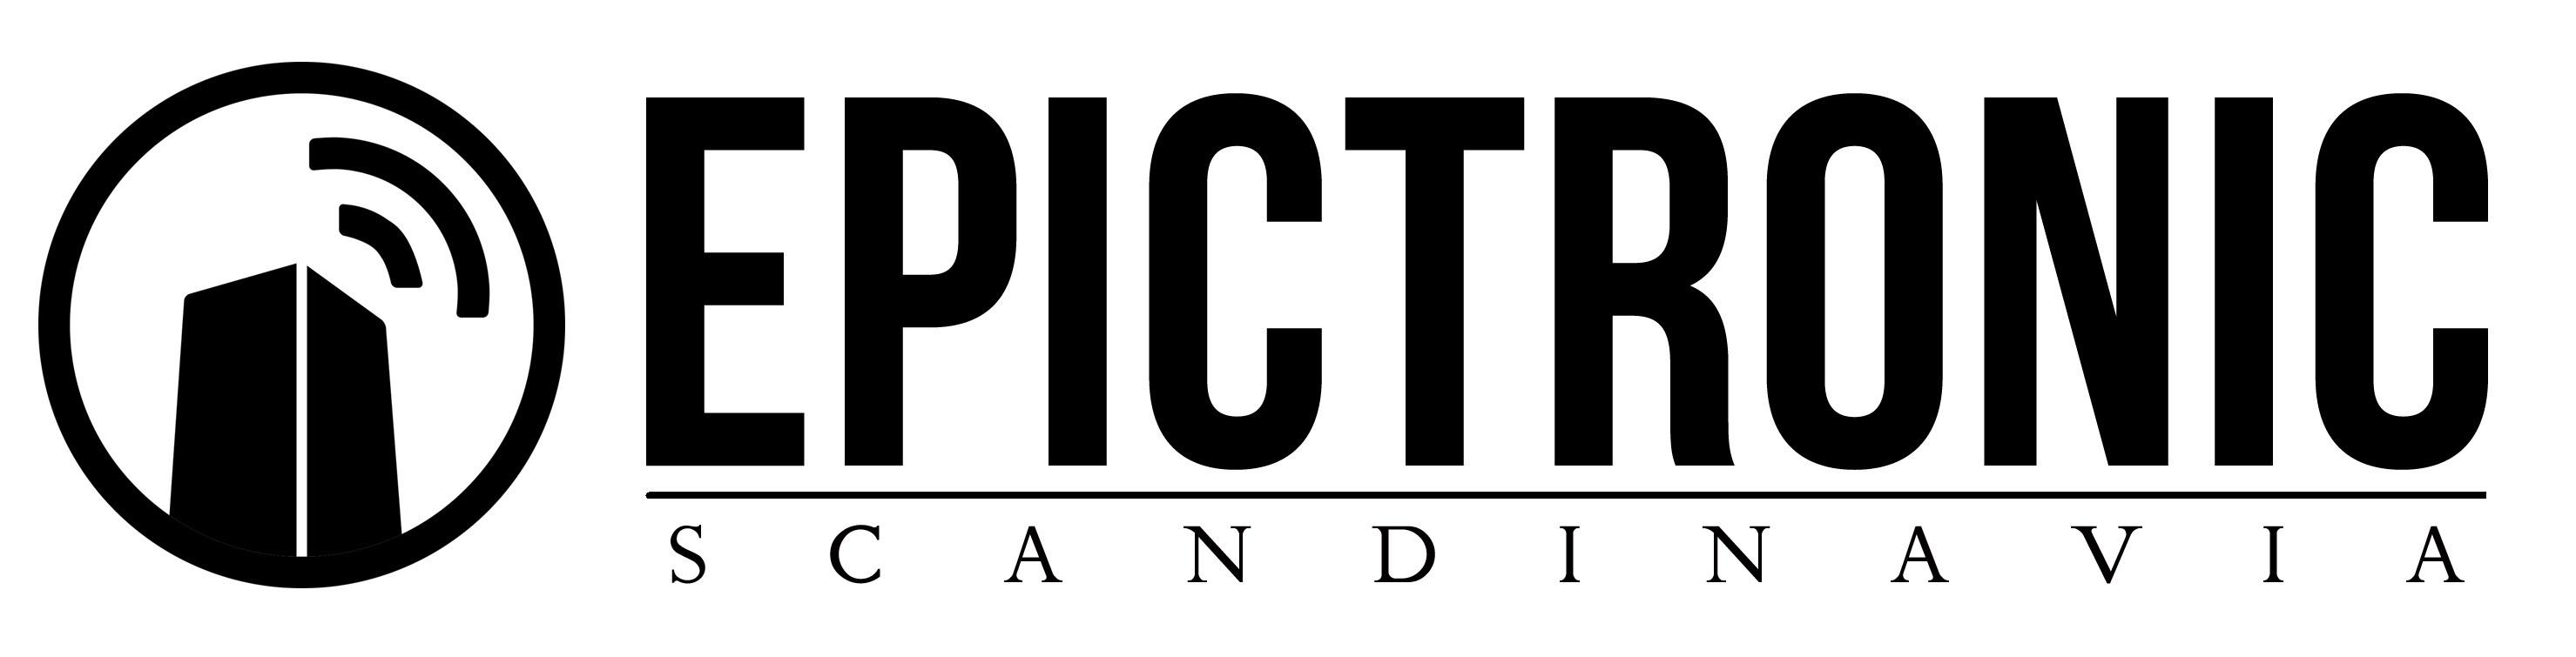 epictronic-logo-black_scandinavia